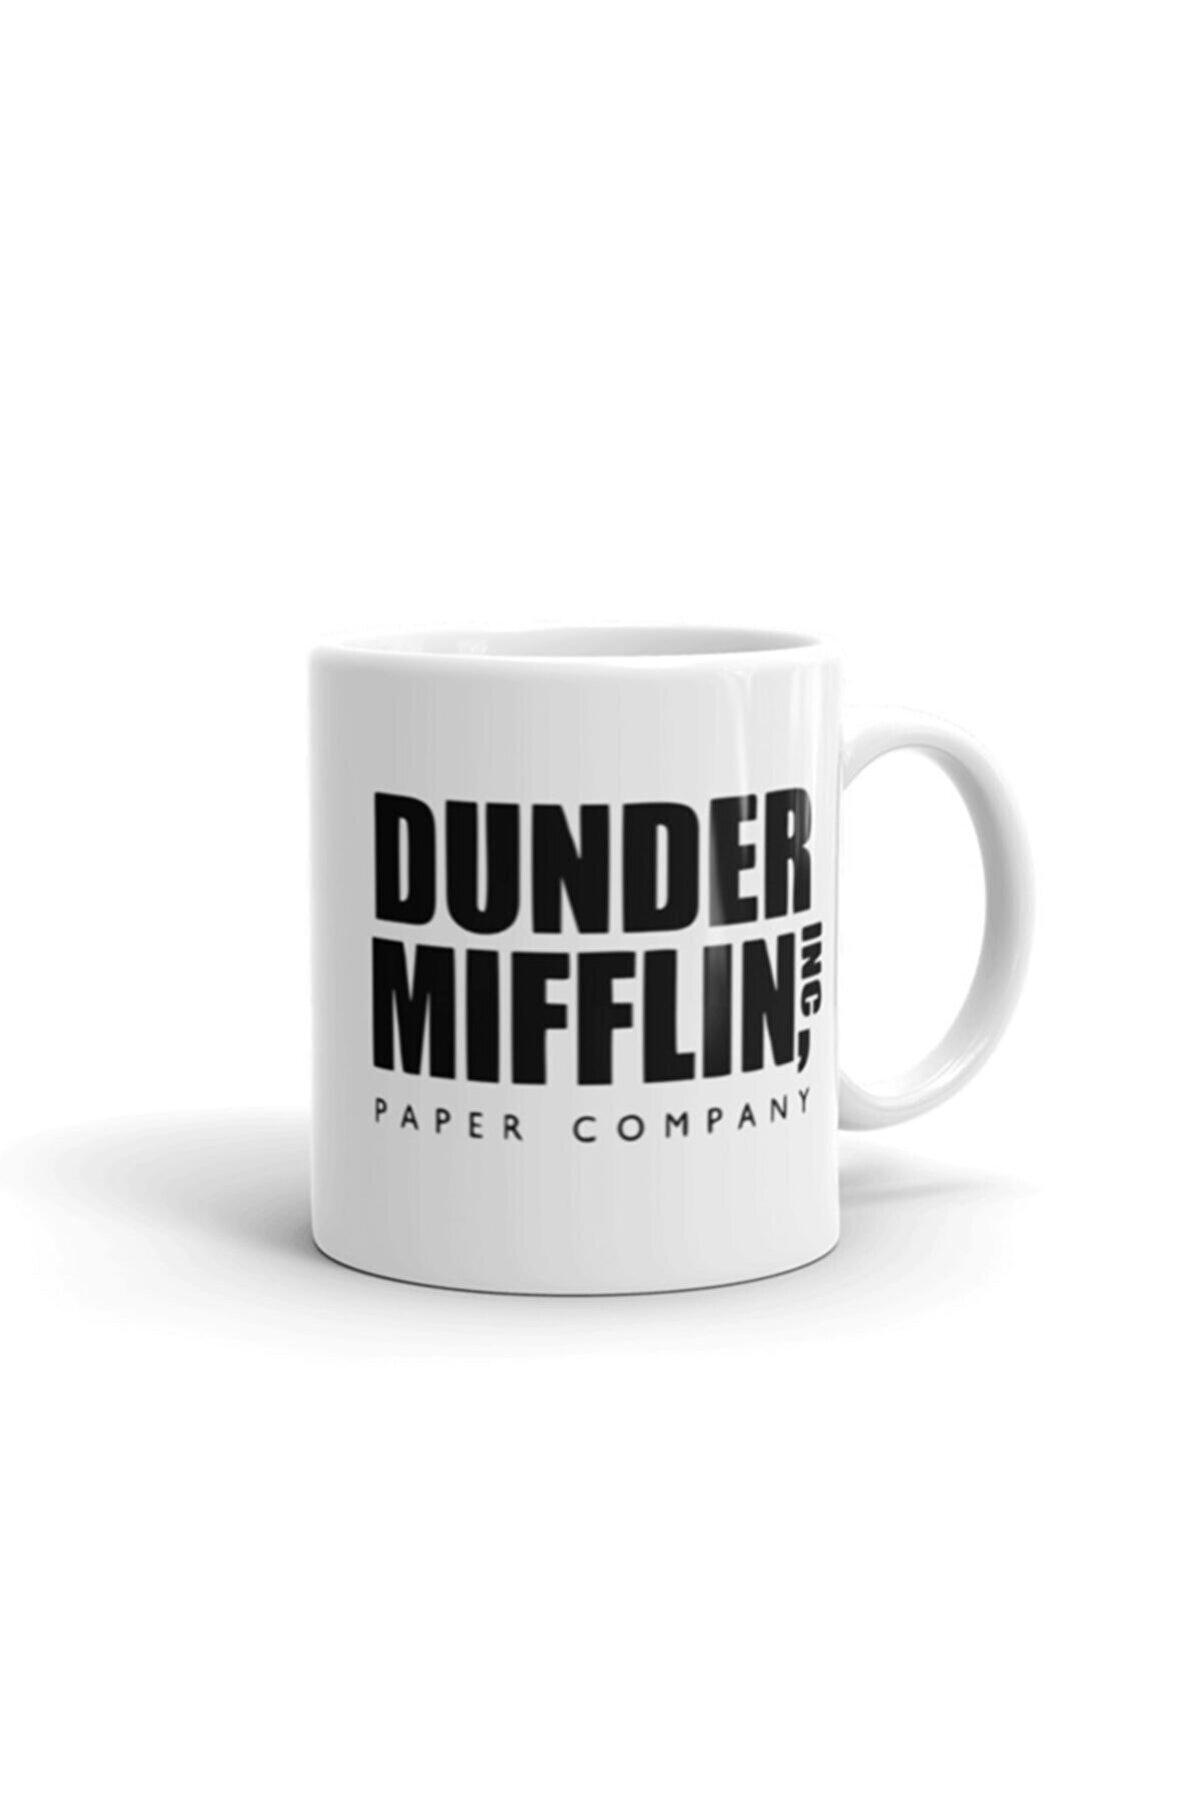 Bi Tıkla Gelsin Dunder Mifflin, World's Best Boss, The Office Tv Show Kupa Bardak